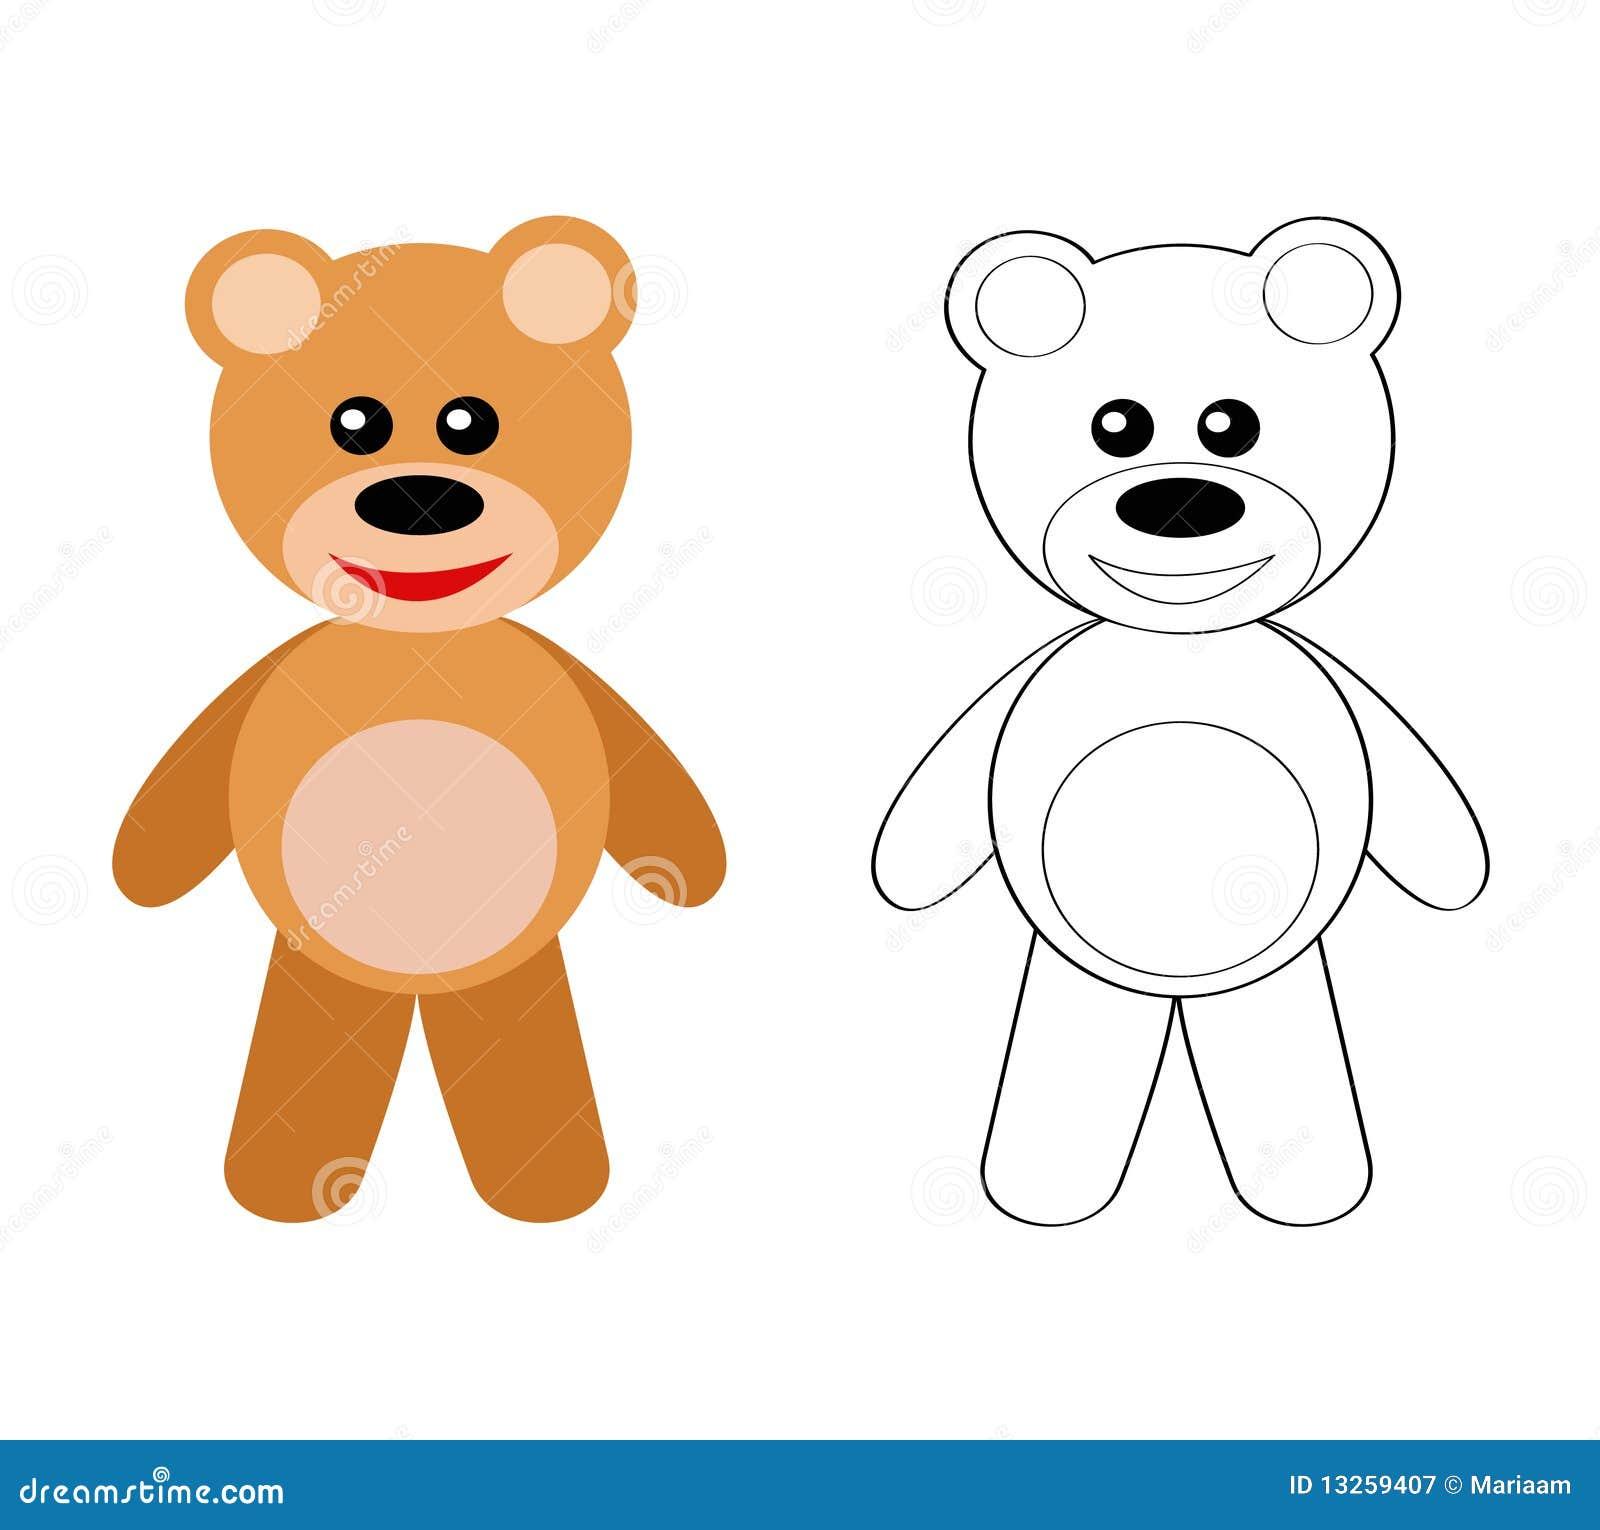 Teddy Bear Royalty Free Stock Photography - Image: 13259407 - photo#39